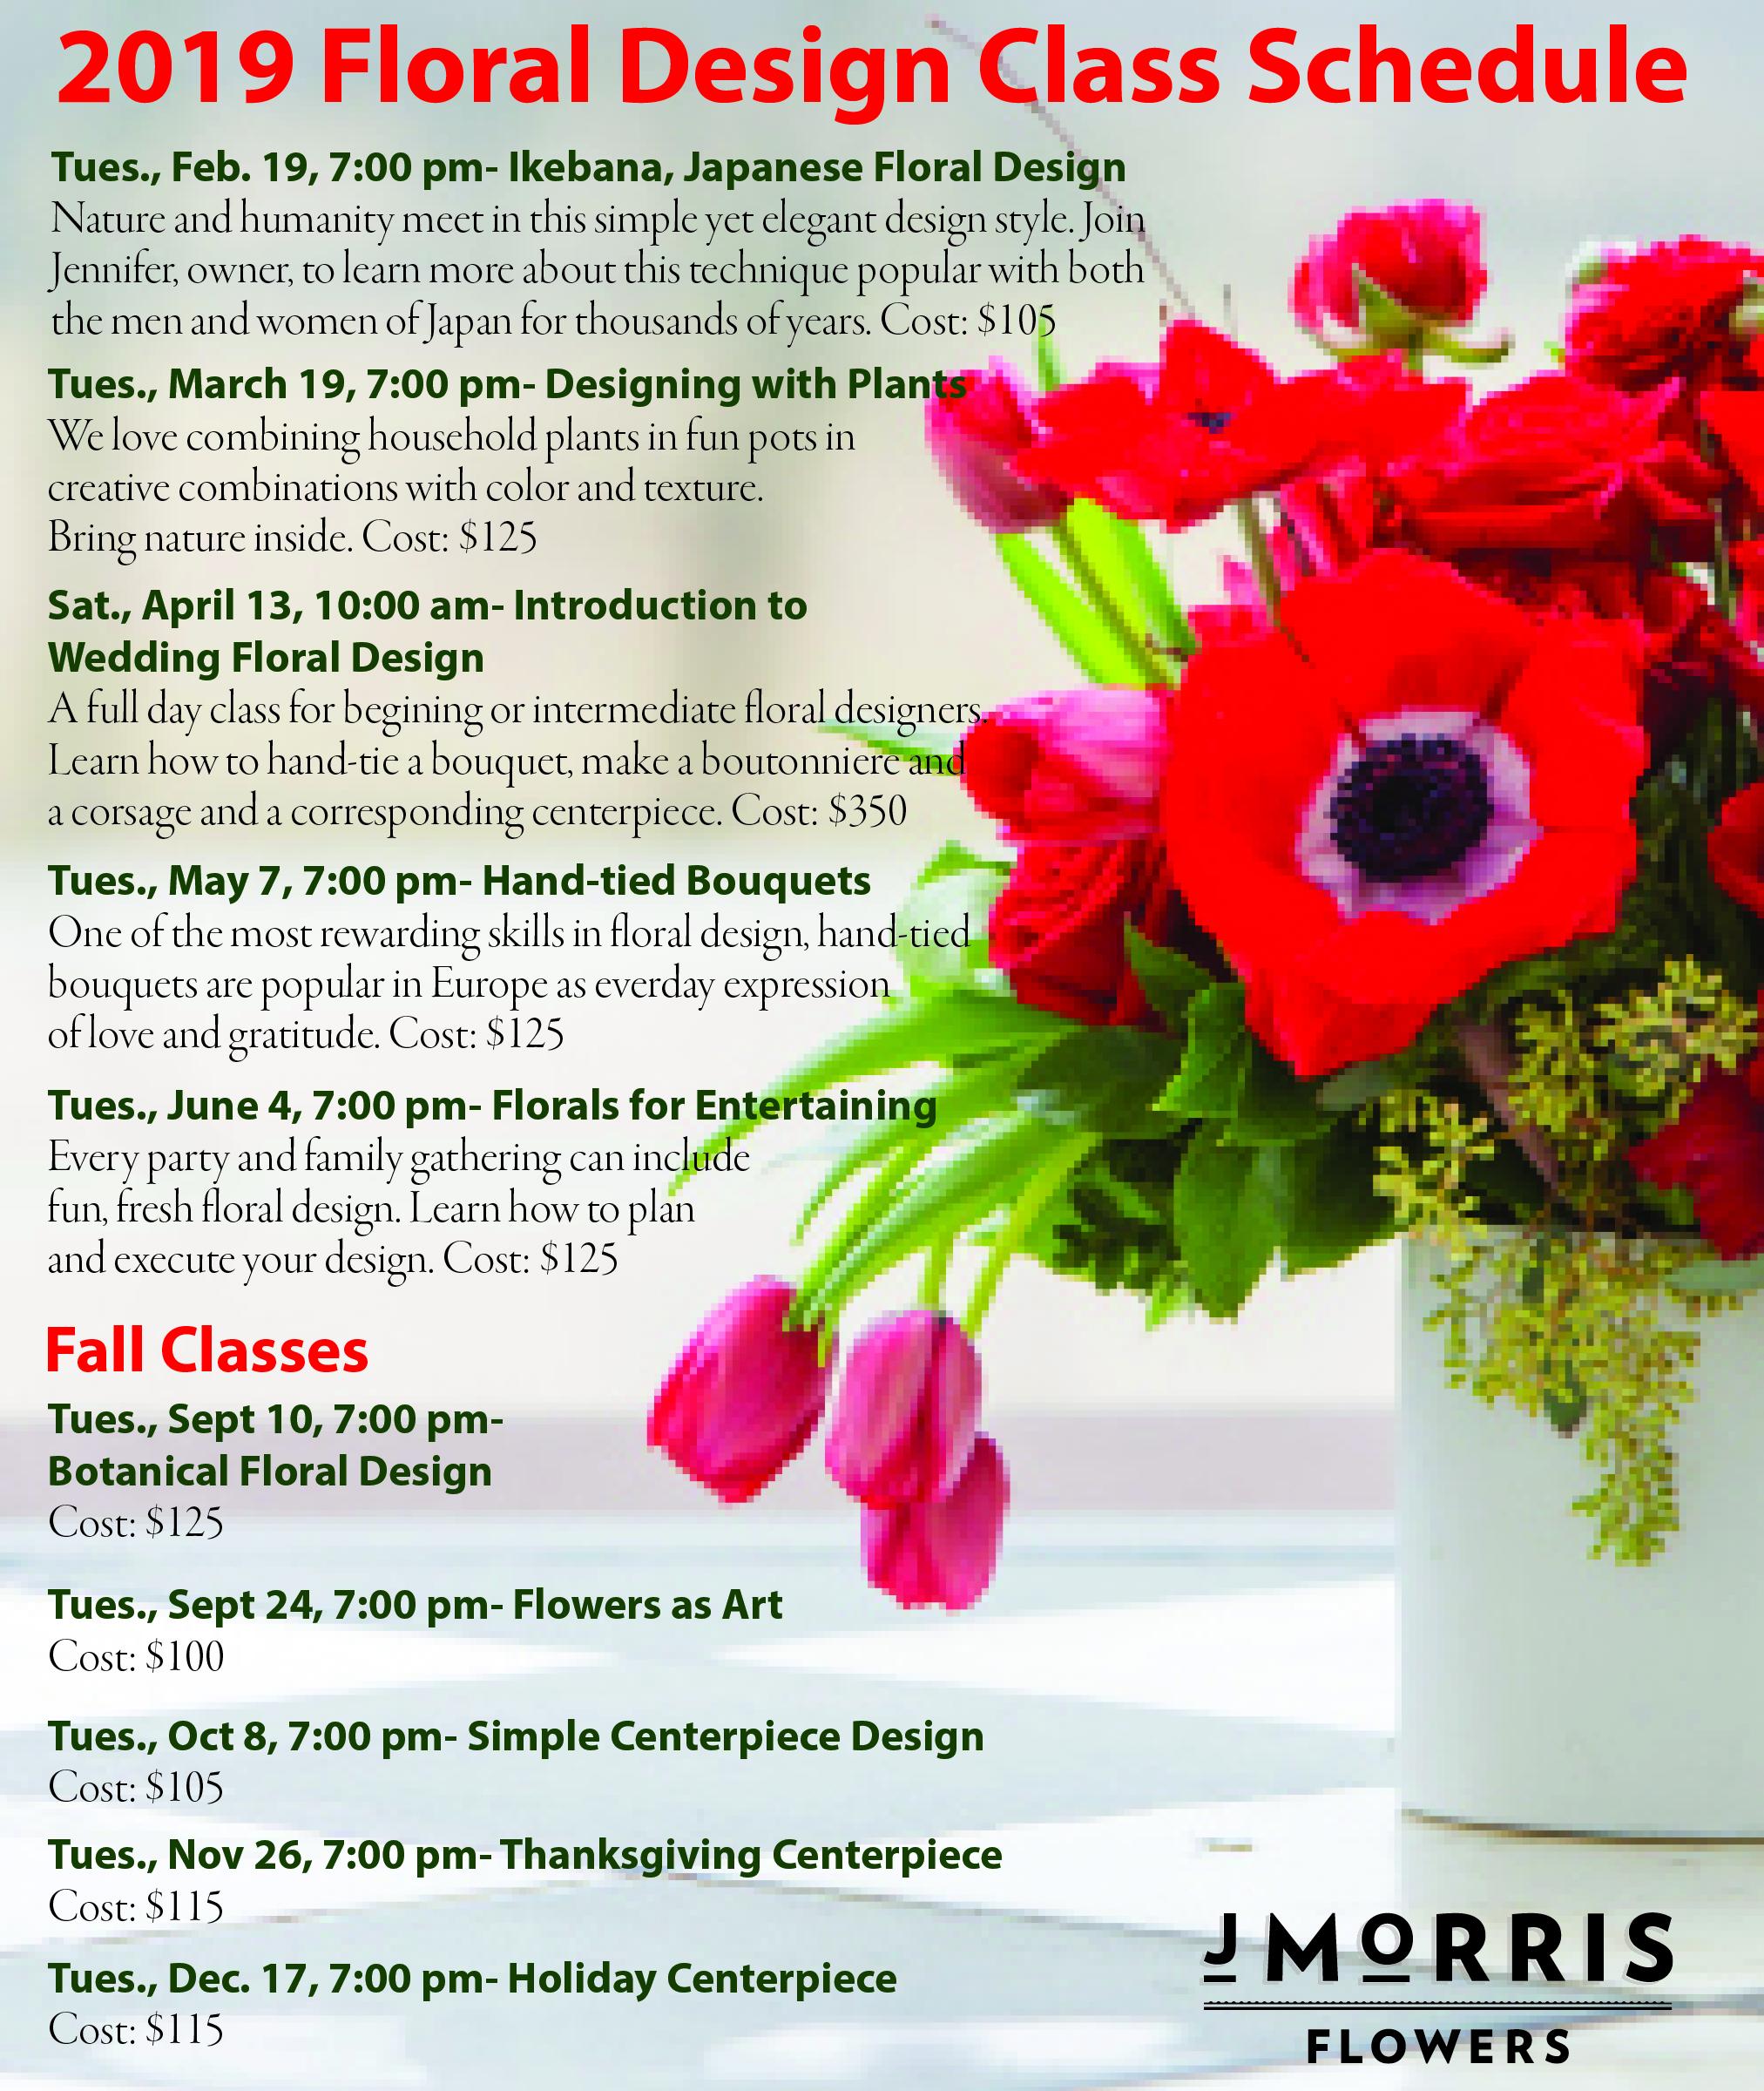 Floral-design-classes-19 2.jpg